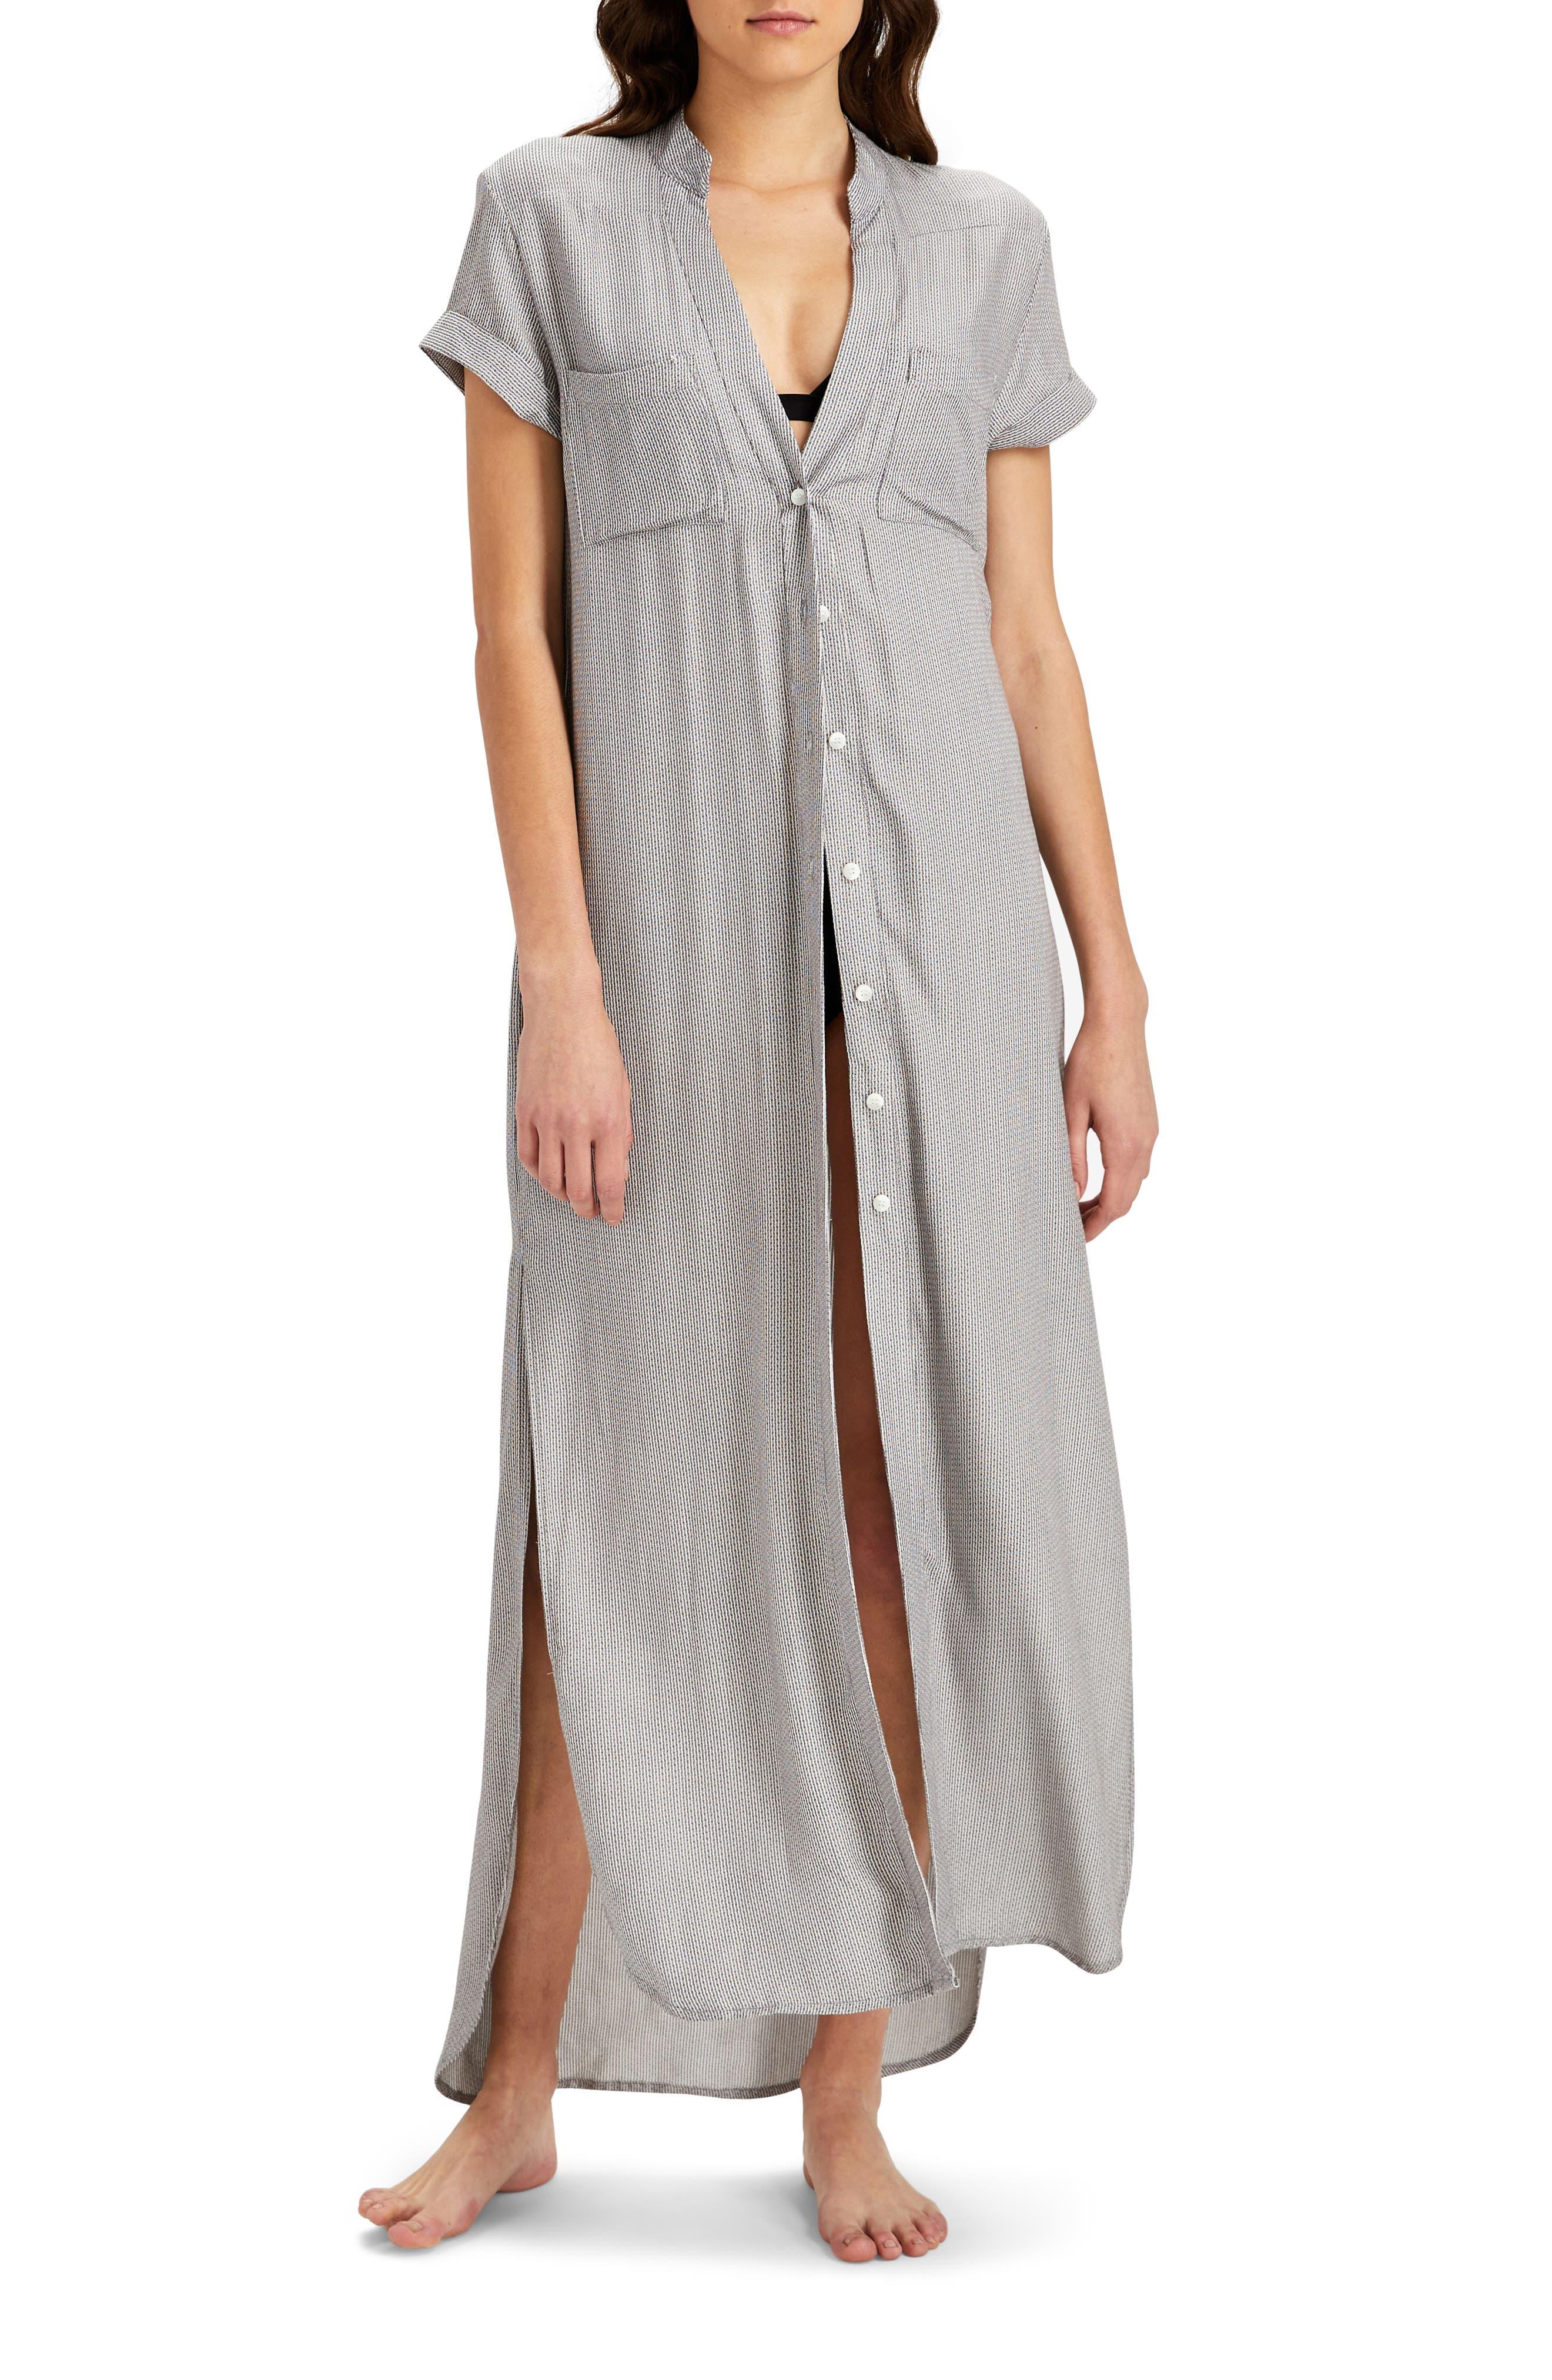 Kim Button Down Cover-Up Dress,                             Main thumbnail 1, color,                             022